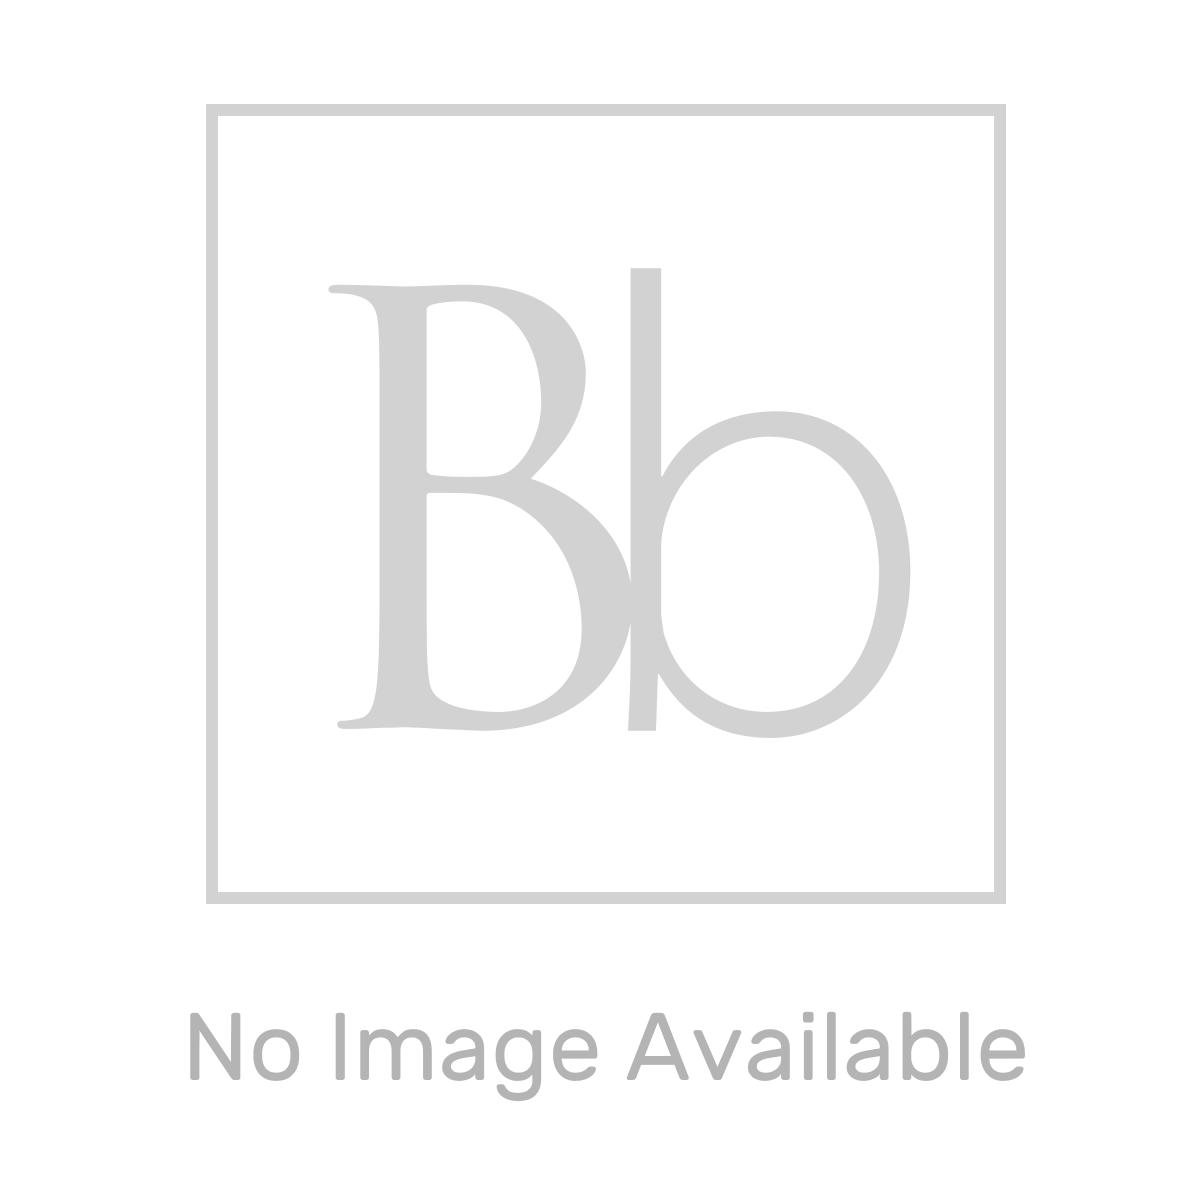 RAK Ecofix Chrome Flush Plate with Round Push Buttons